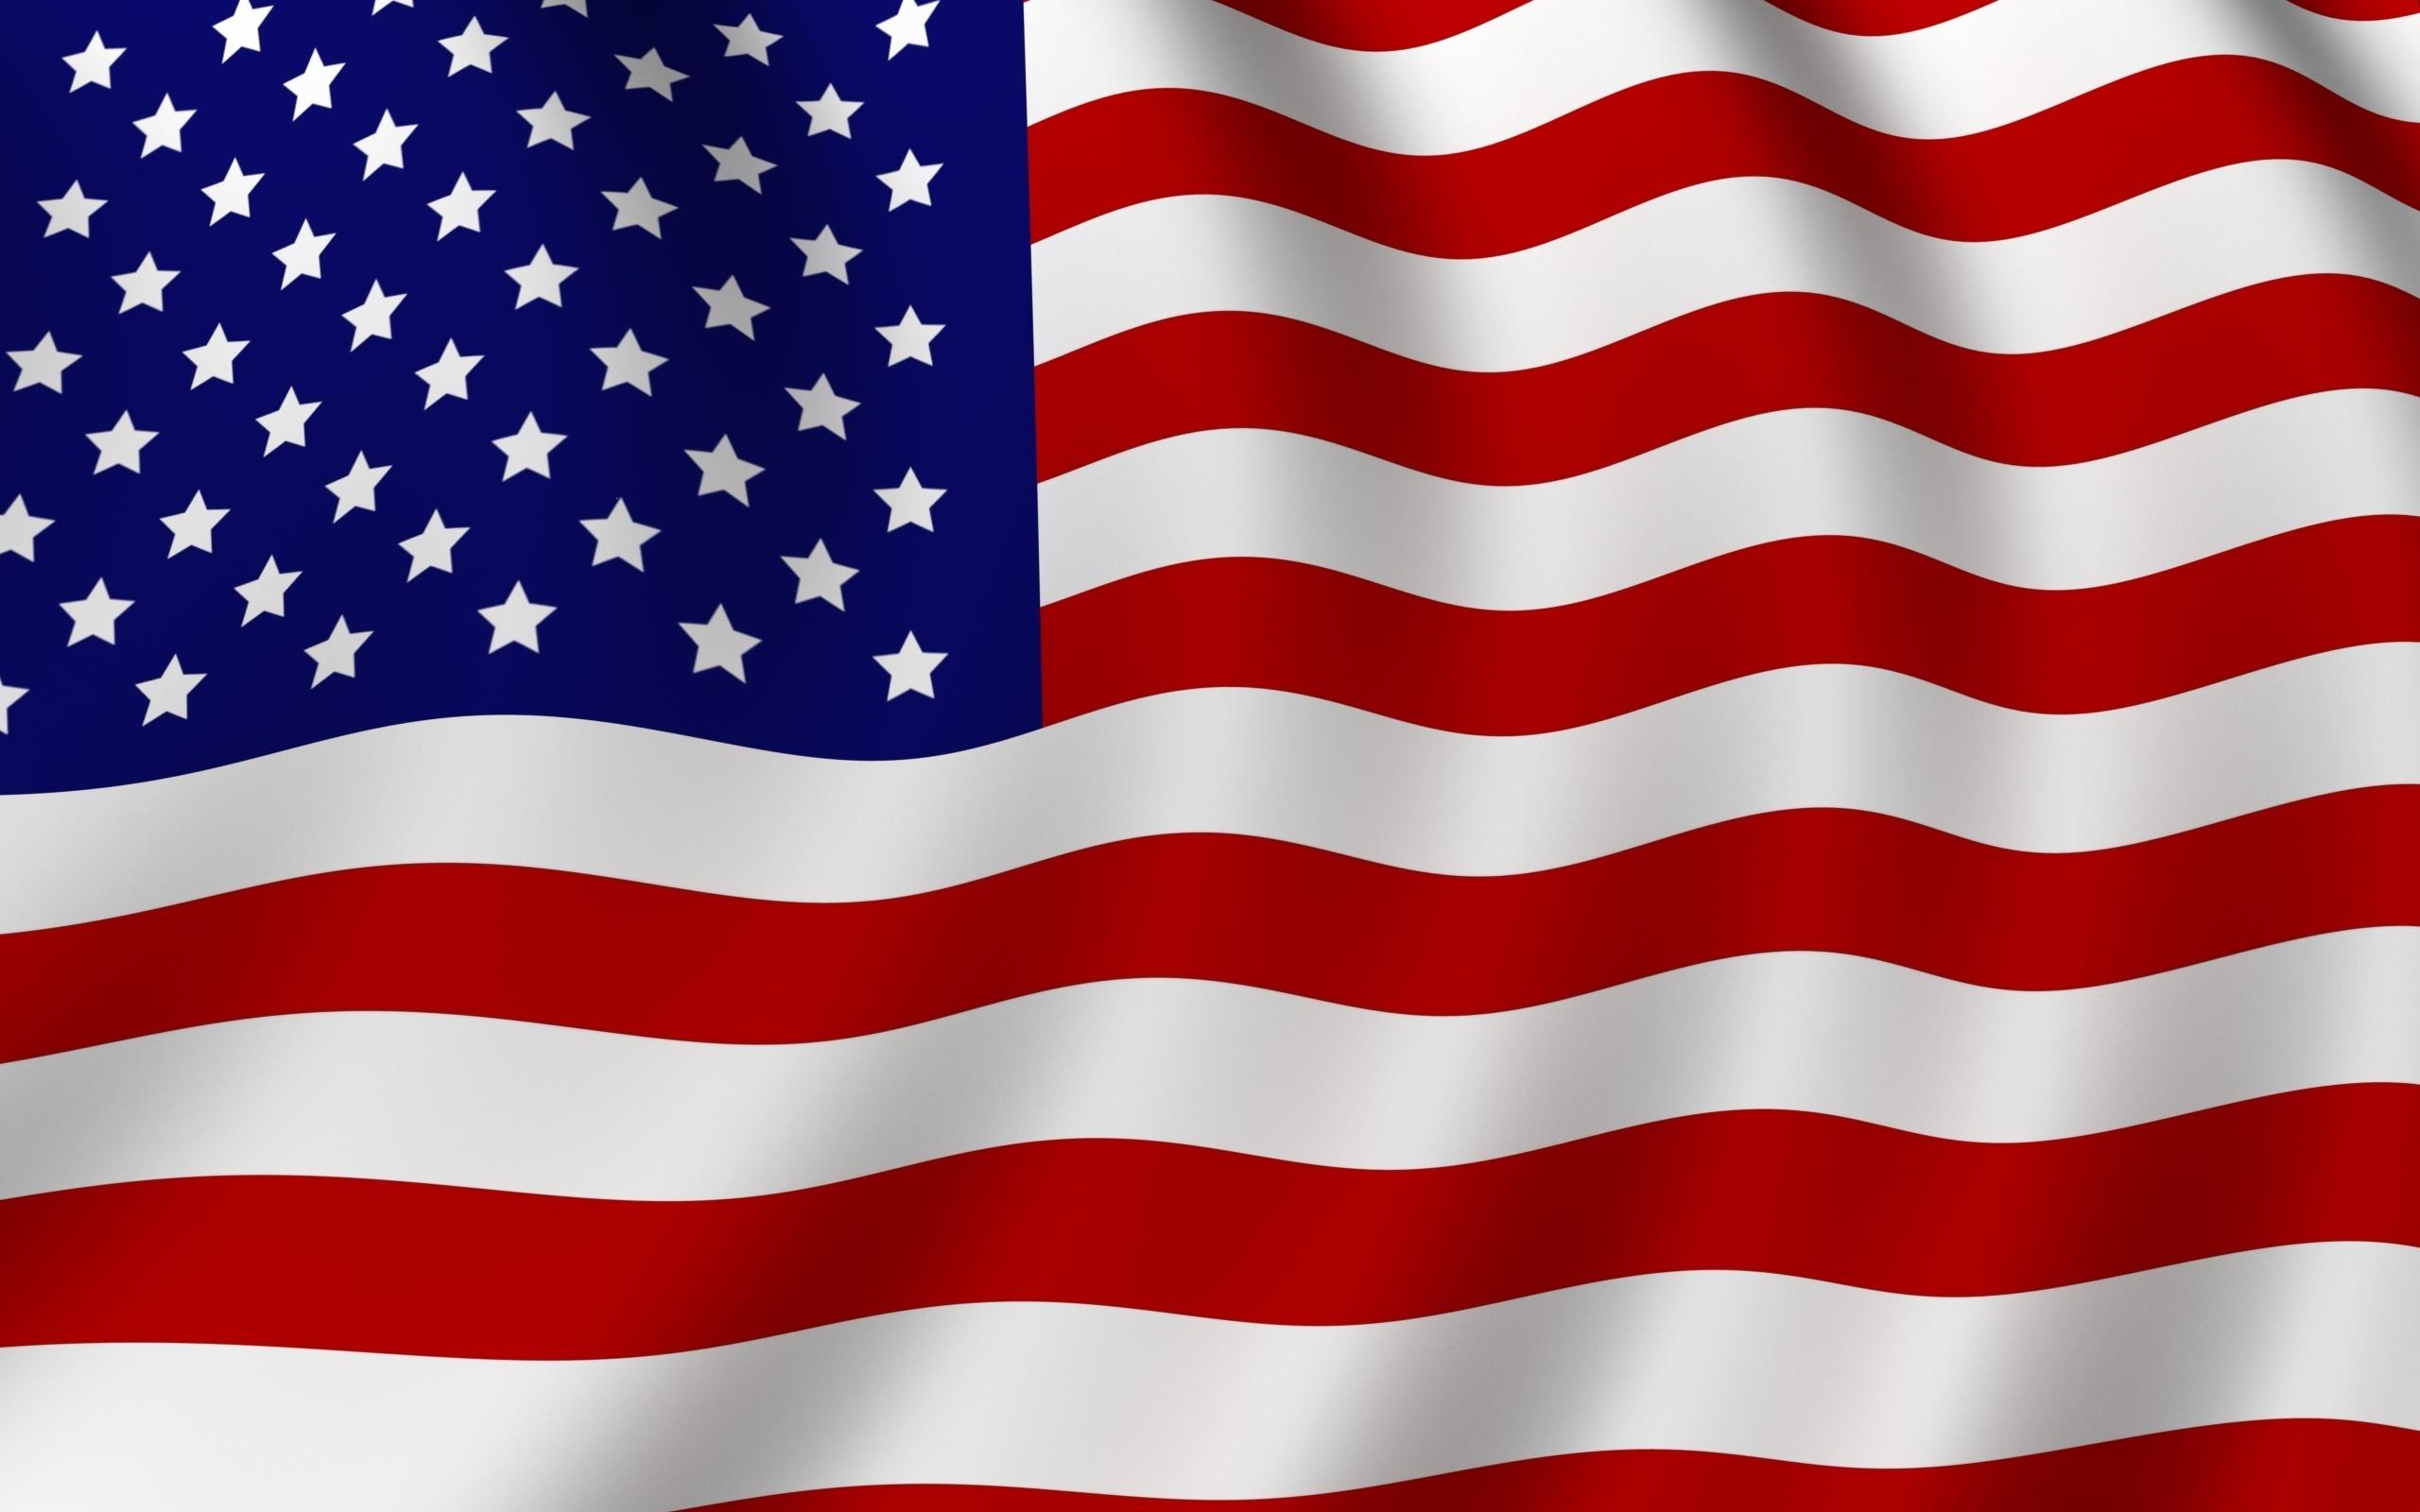 Fall Wallpaper Iphone 6 American Flag Backgrounds Pixelstalk Net